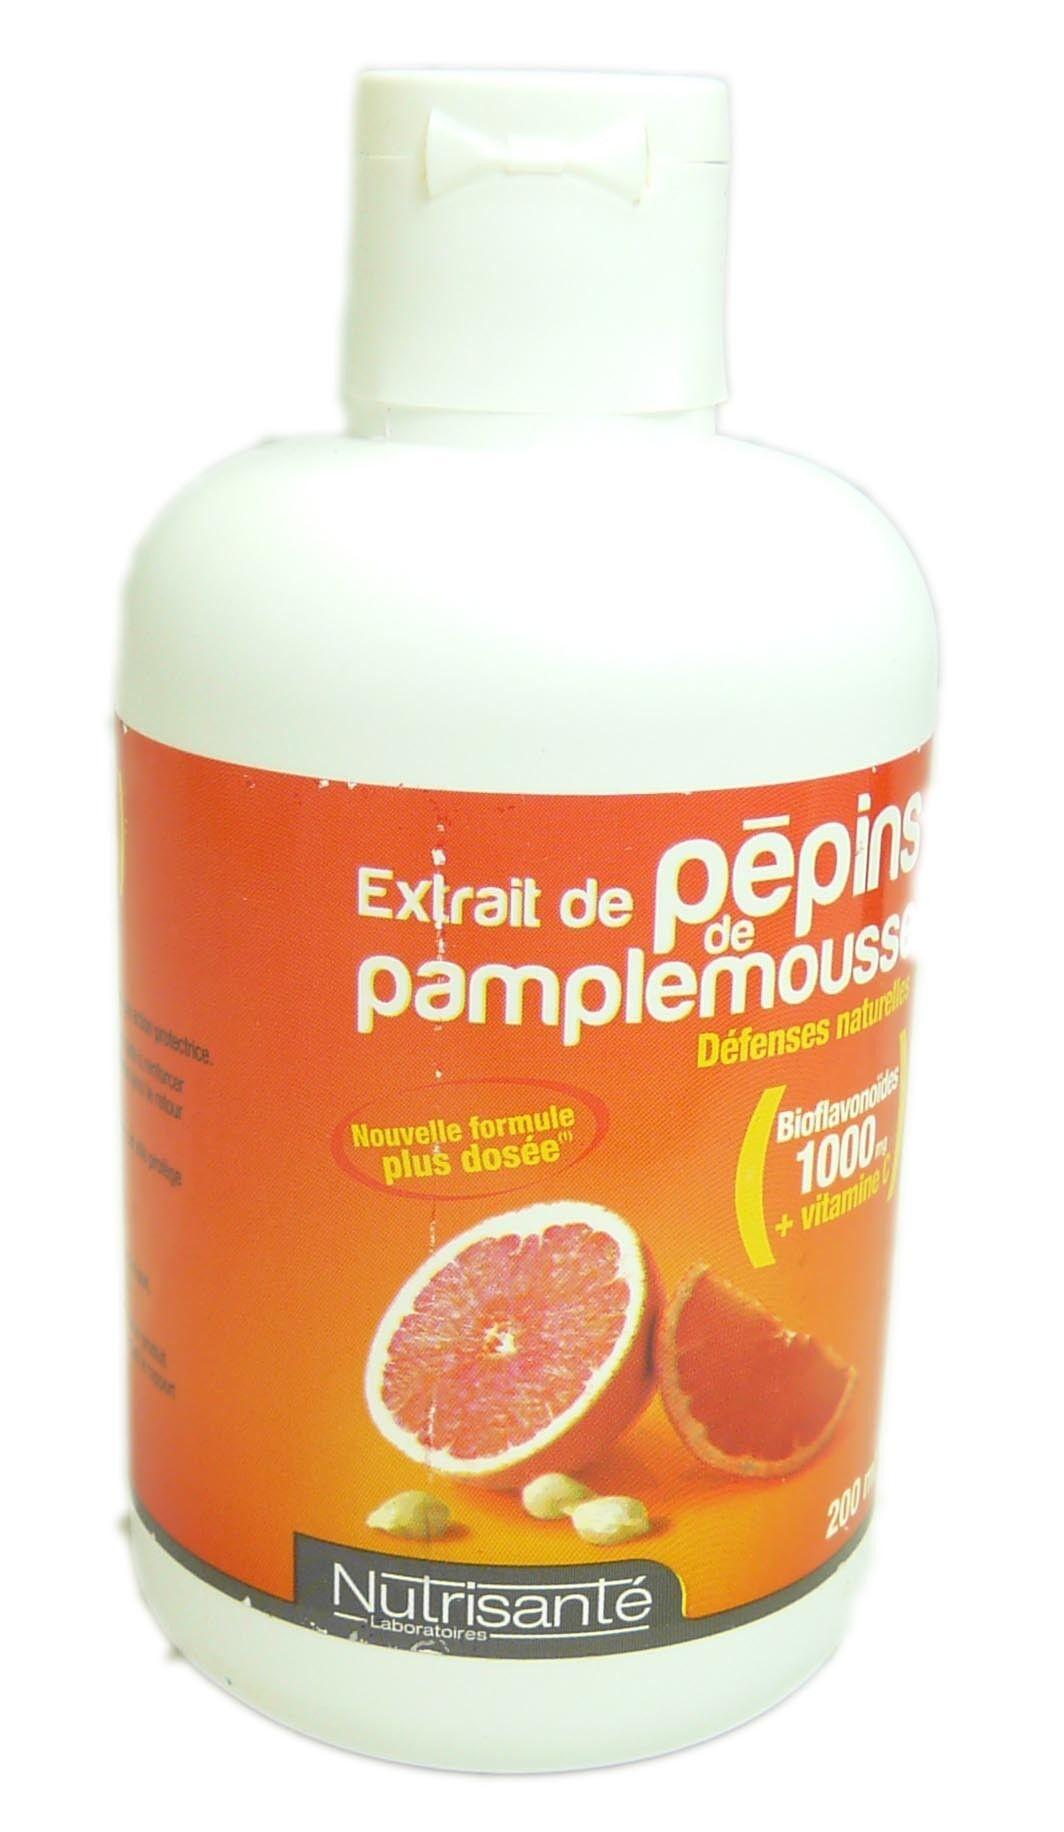 NUTRISANTE Extrait pepin  pamplemousse nutrisante 200ml